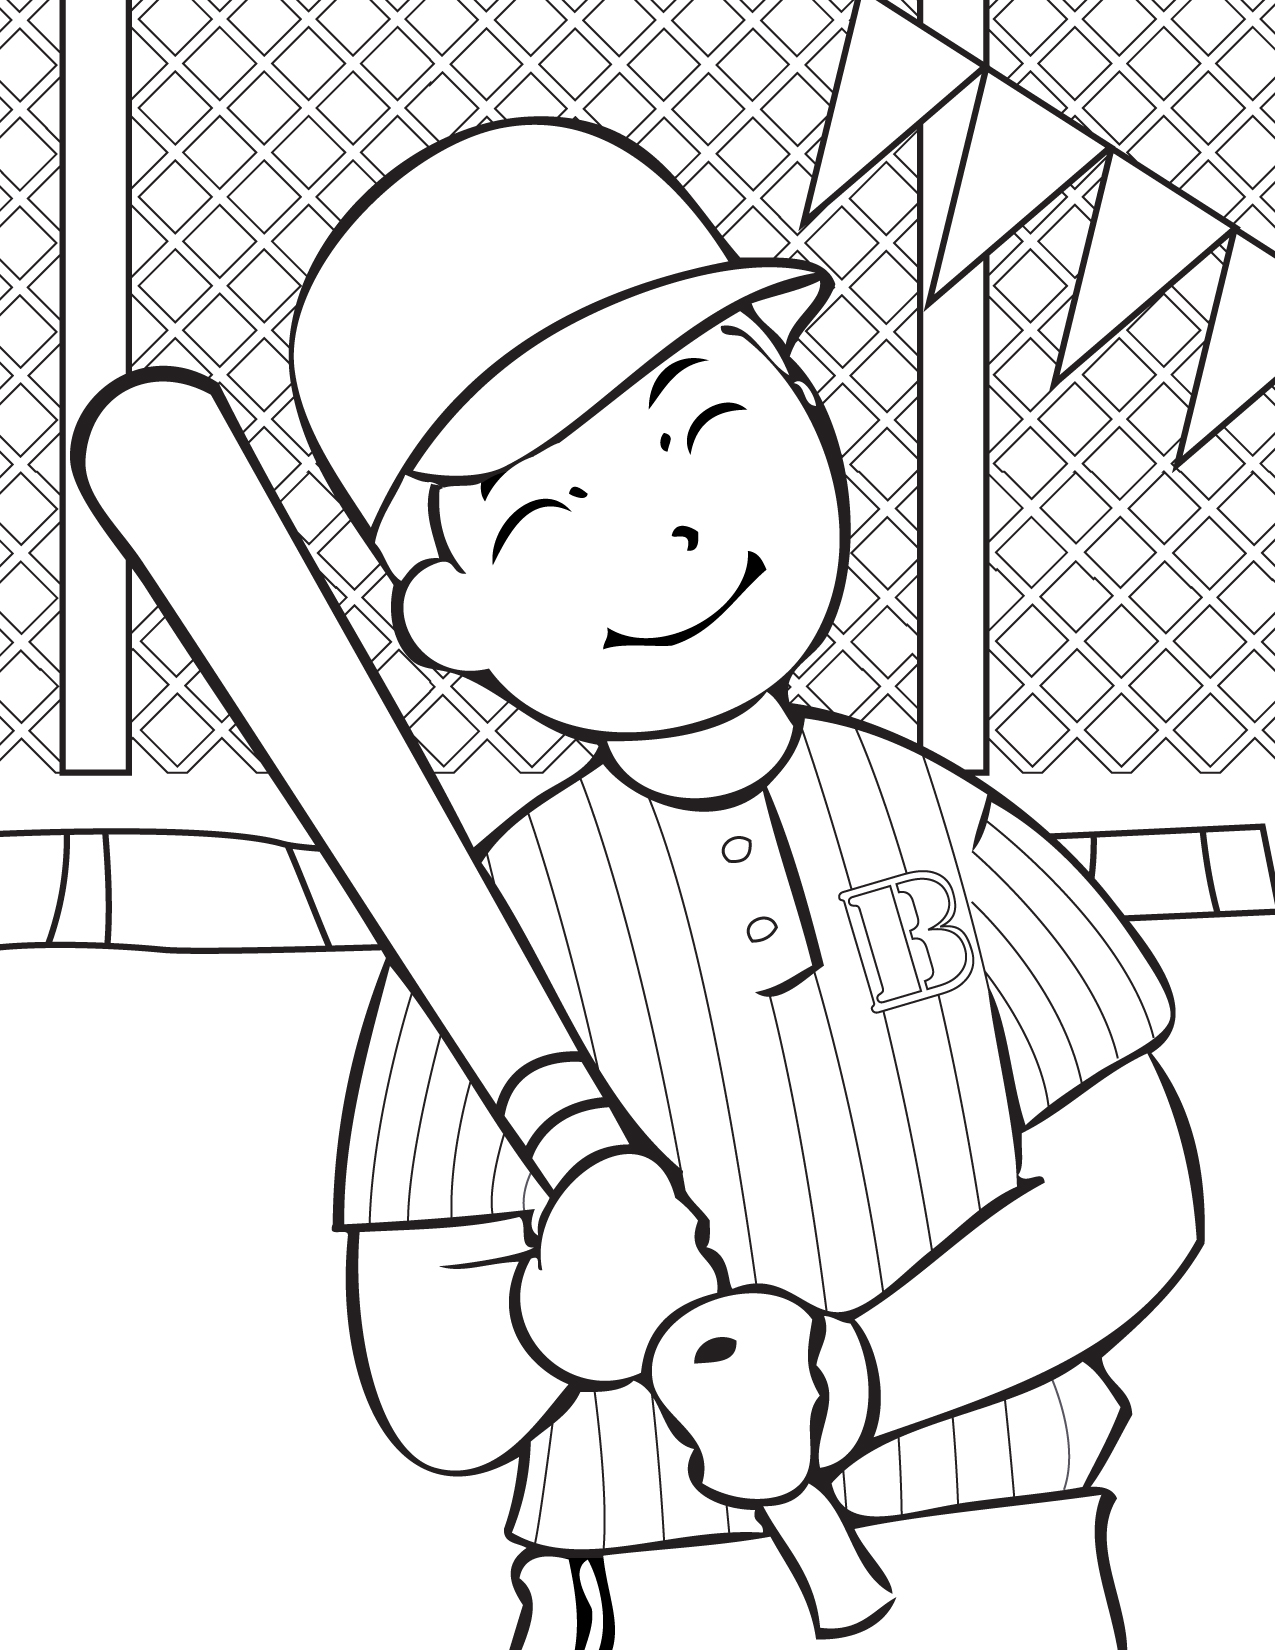 Smiling Baseball Player